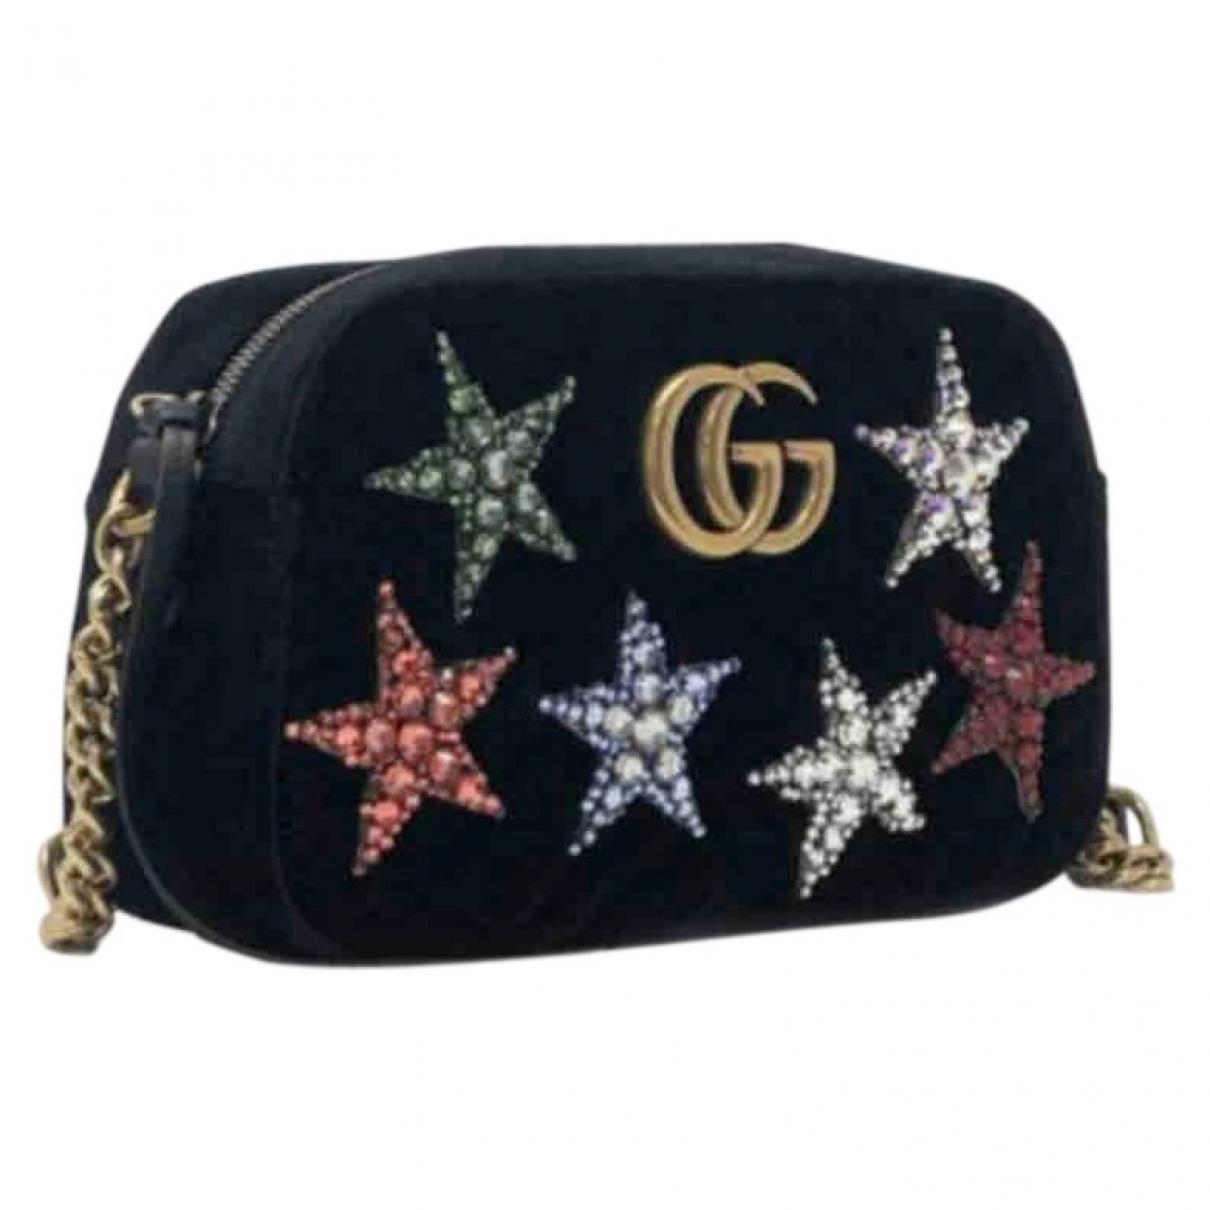 Gucci Marmont Black Suede handbag for Women N